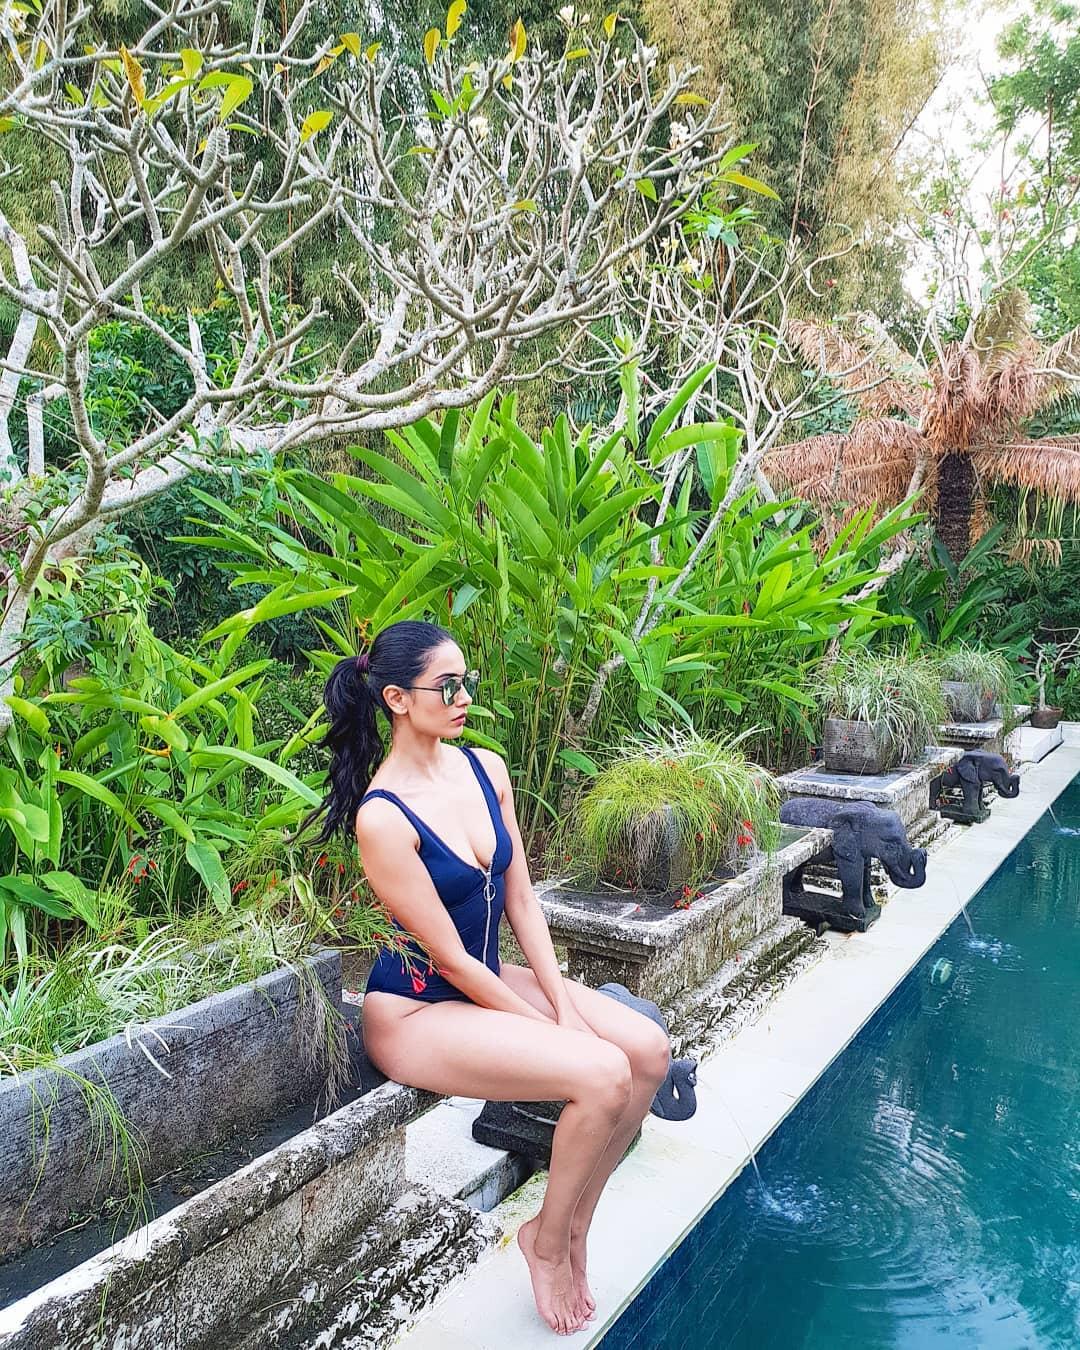 Sarah-Jane Dias Hot Booty In Bikini   Indian Girls Villa - Celebs Beauty, Fashion and Entertainment